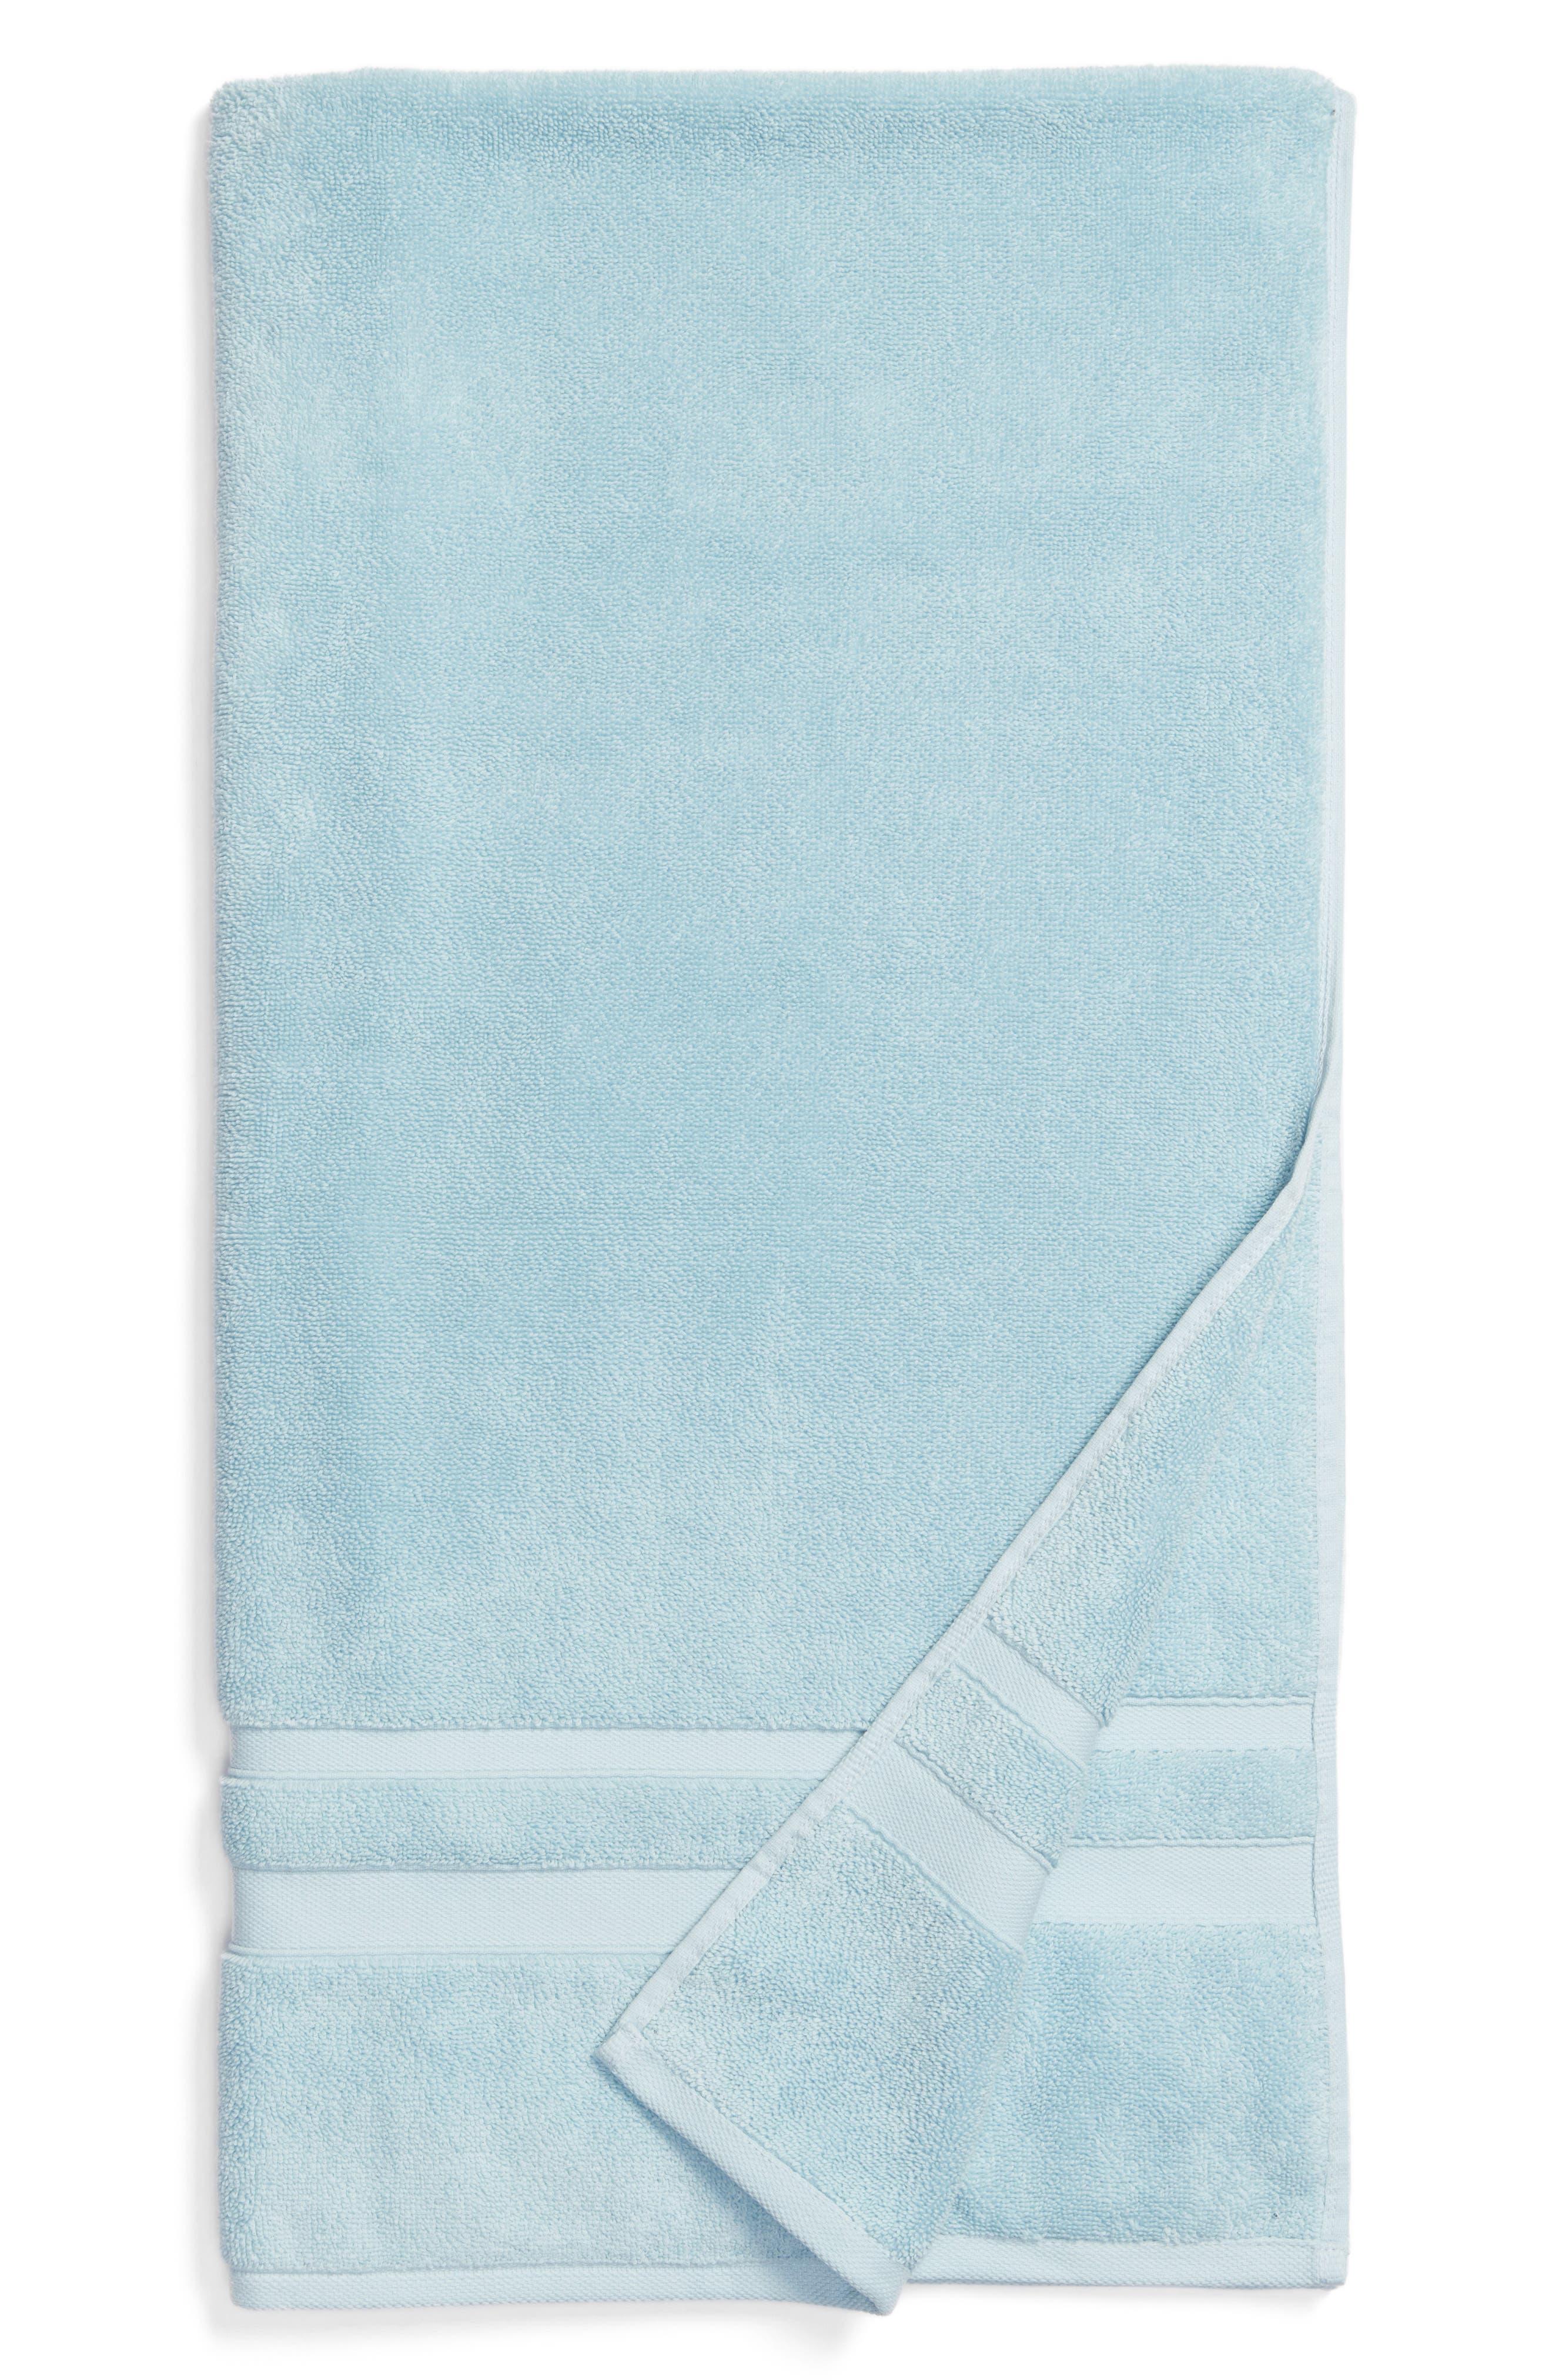 WATERWORKS STUDIO, 'Perennial' Turkish Cotton Bath Towel, Main thumbnail 1, color, CHRYSTAL BLUE